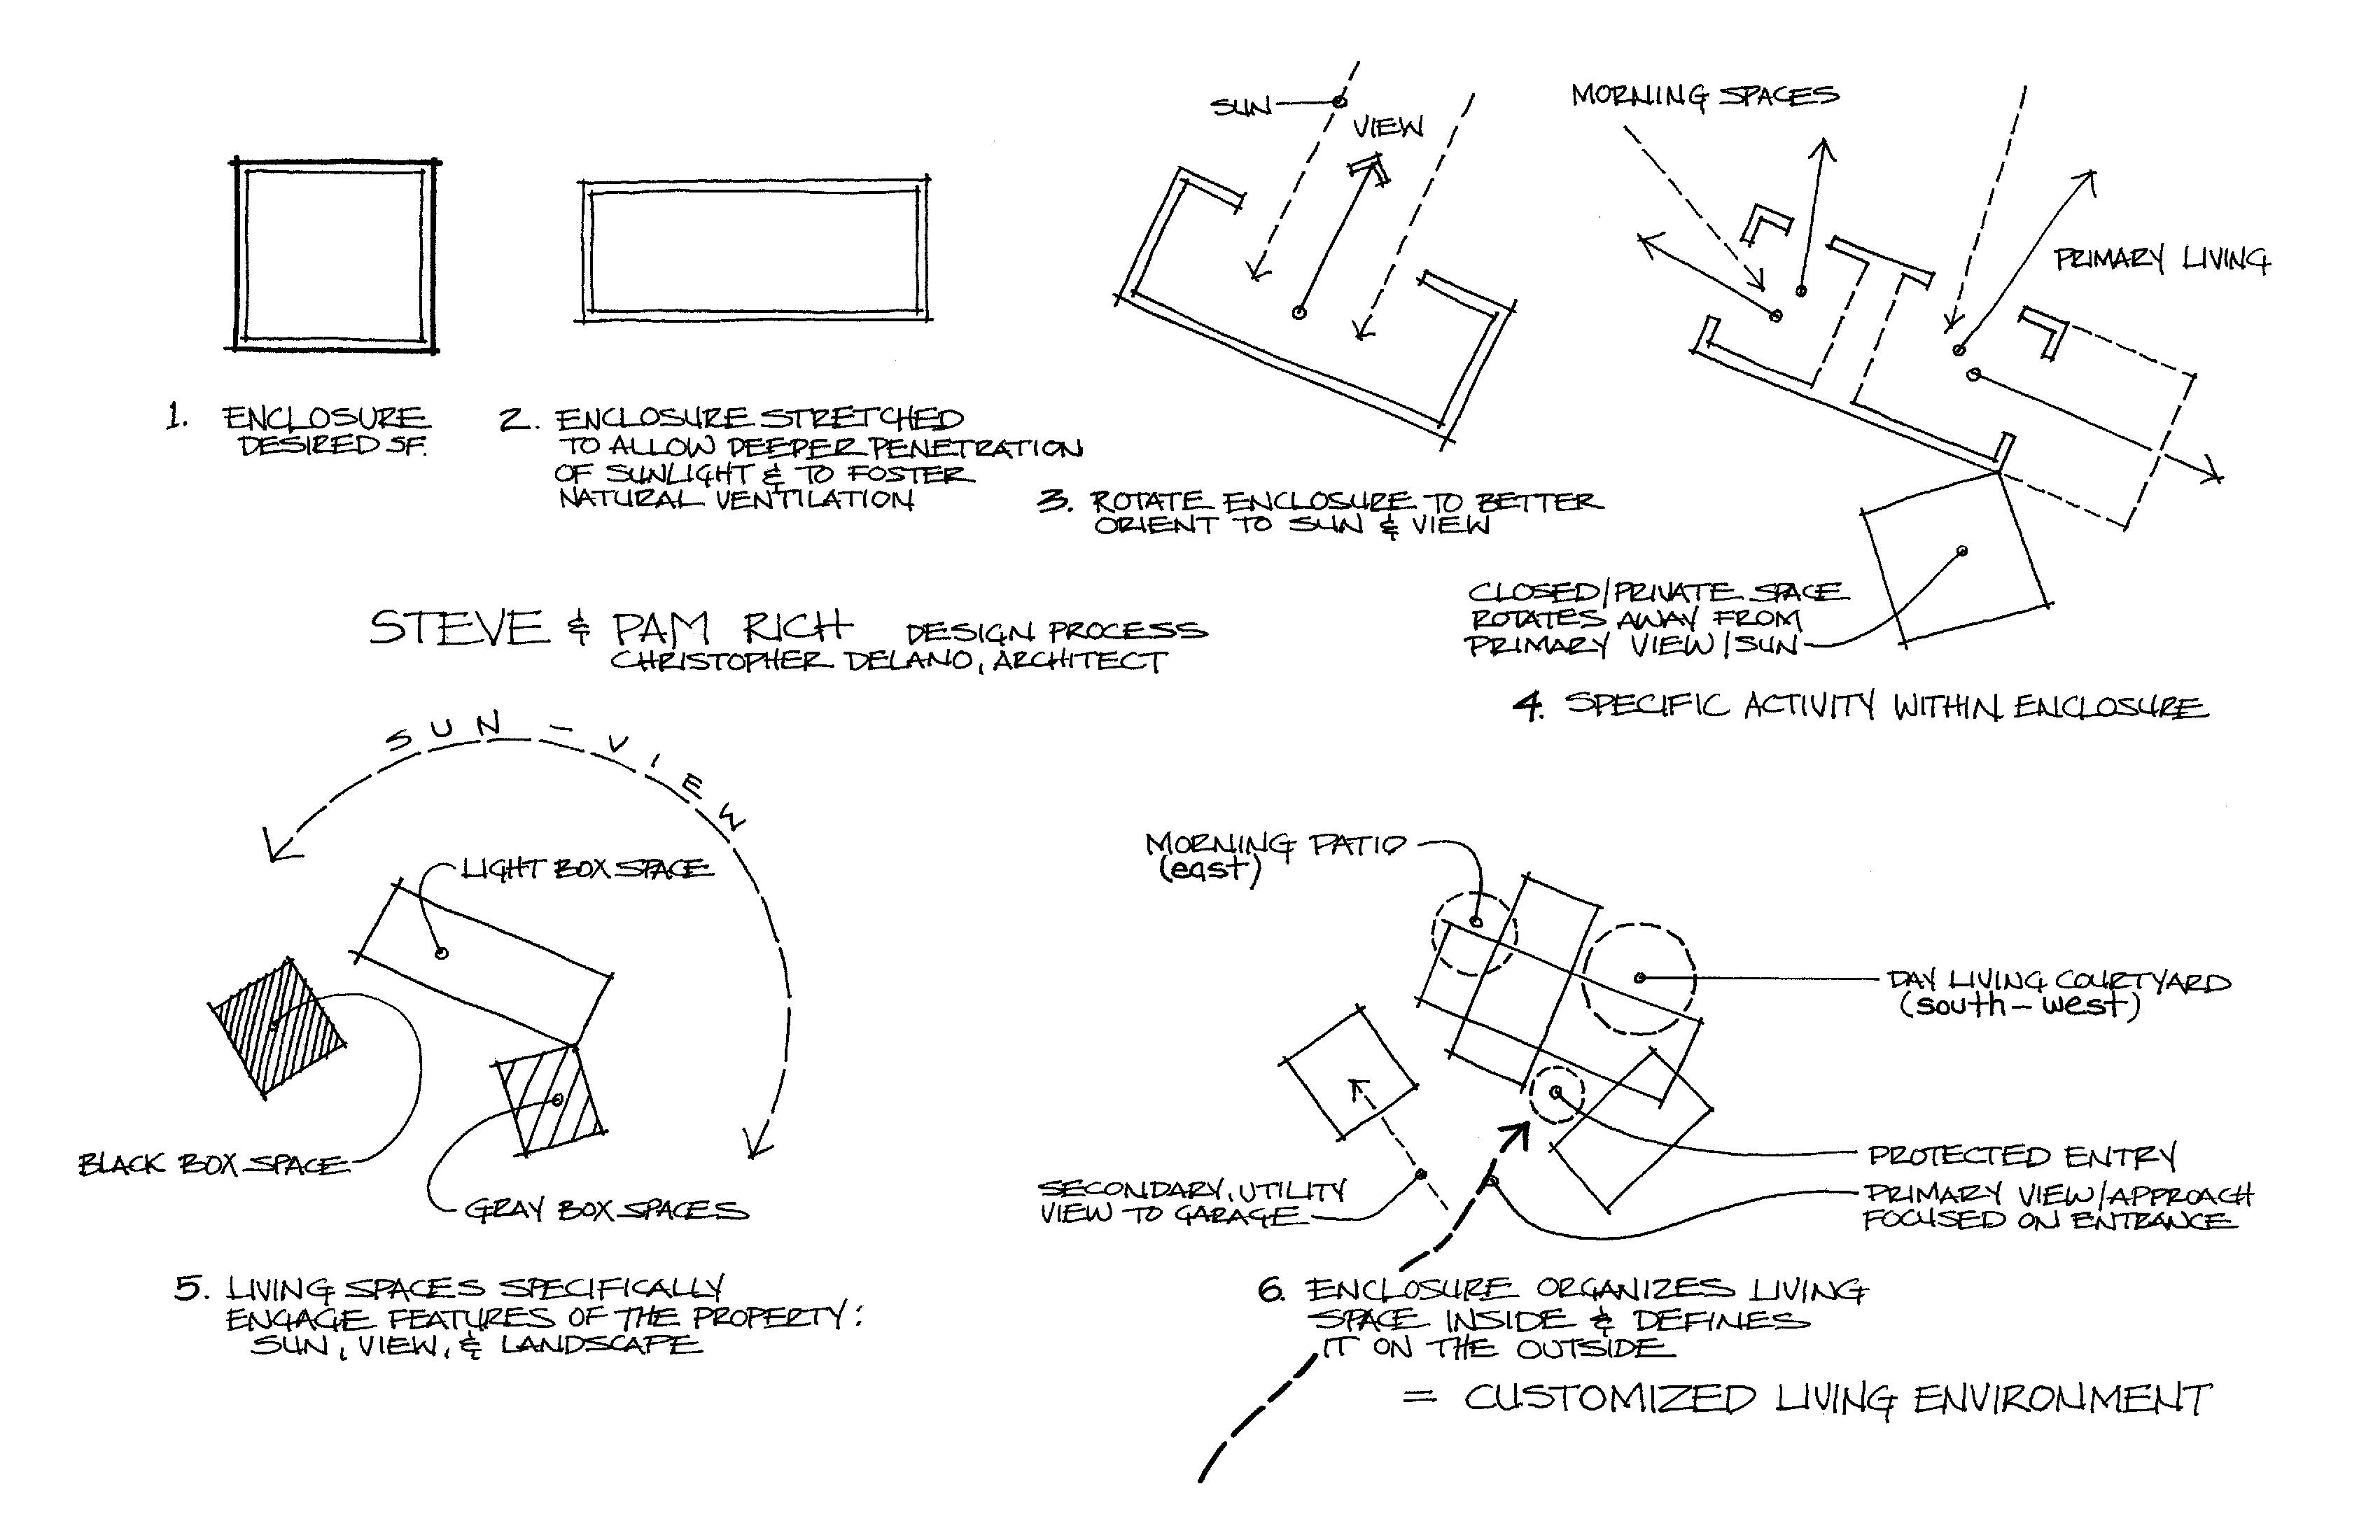 Design Process sketch